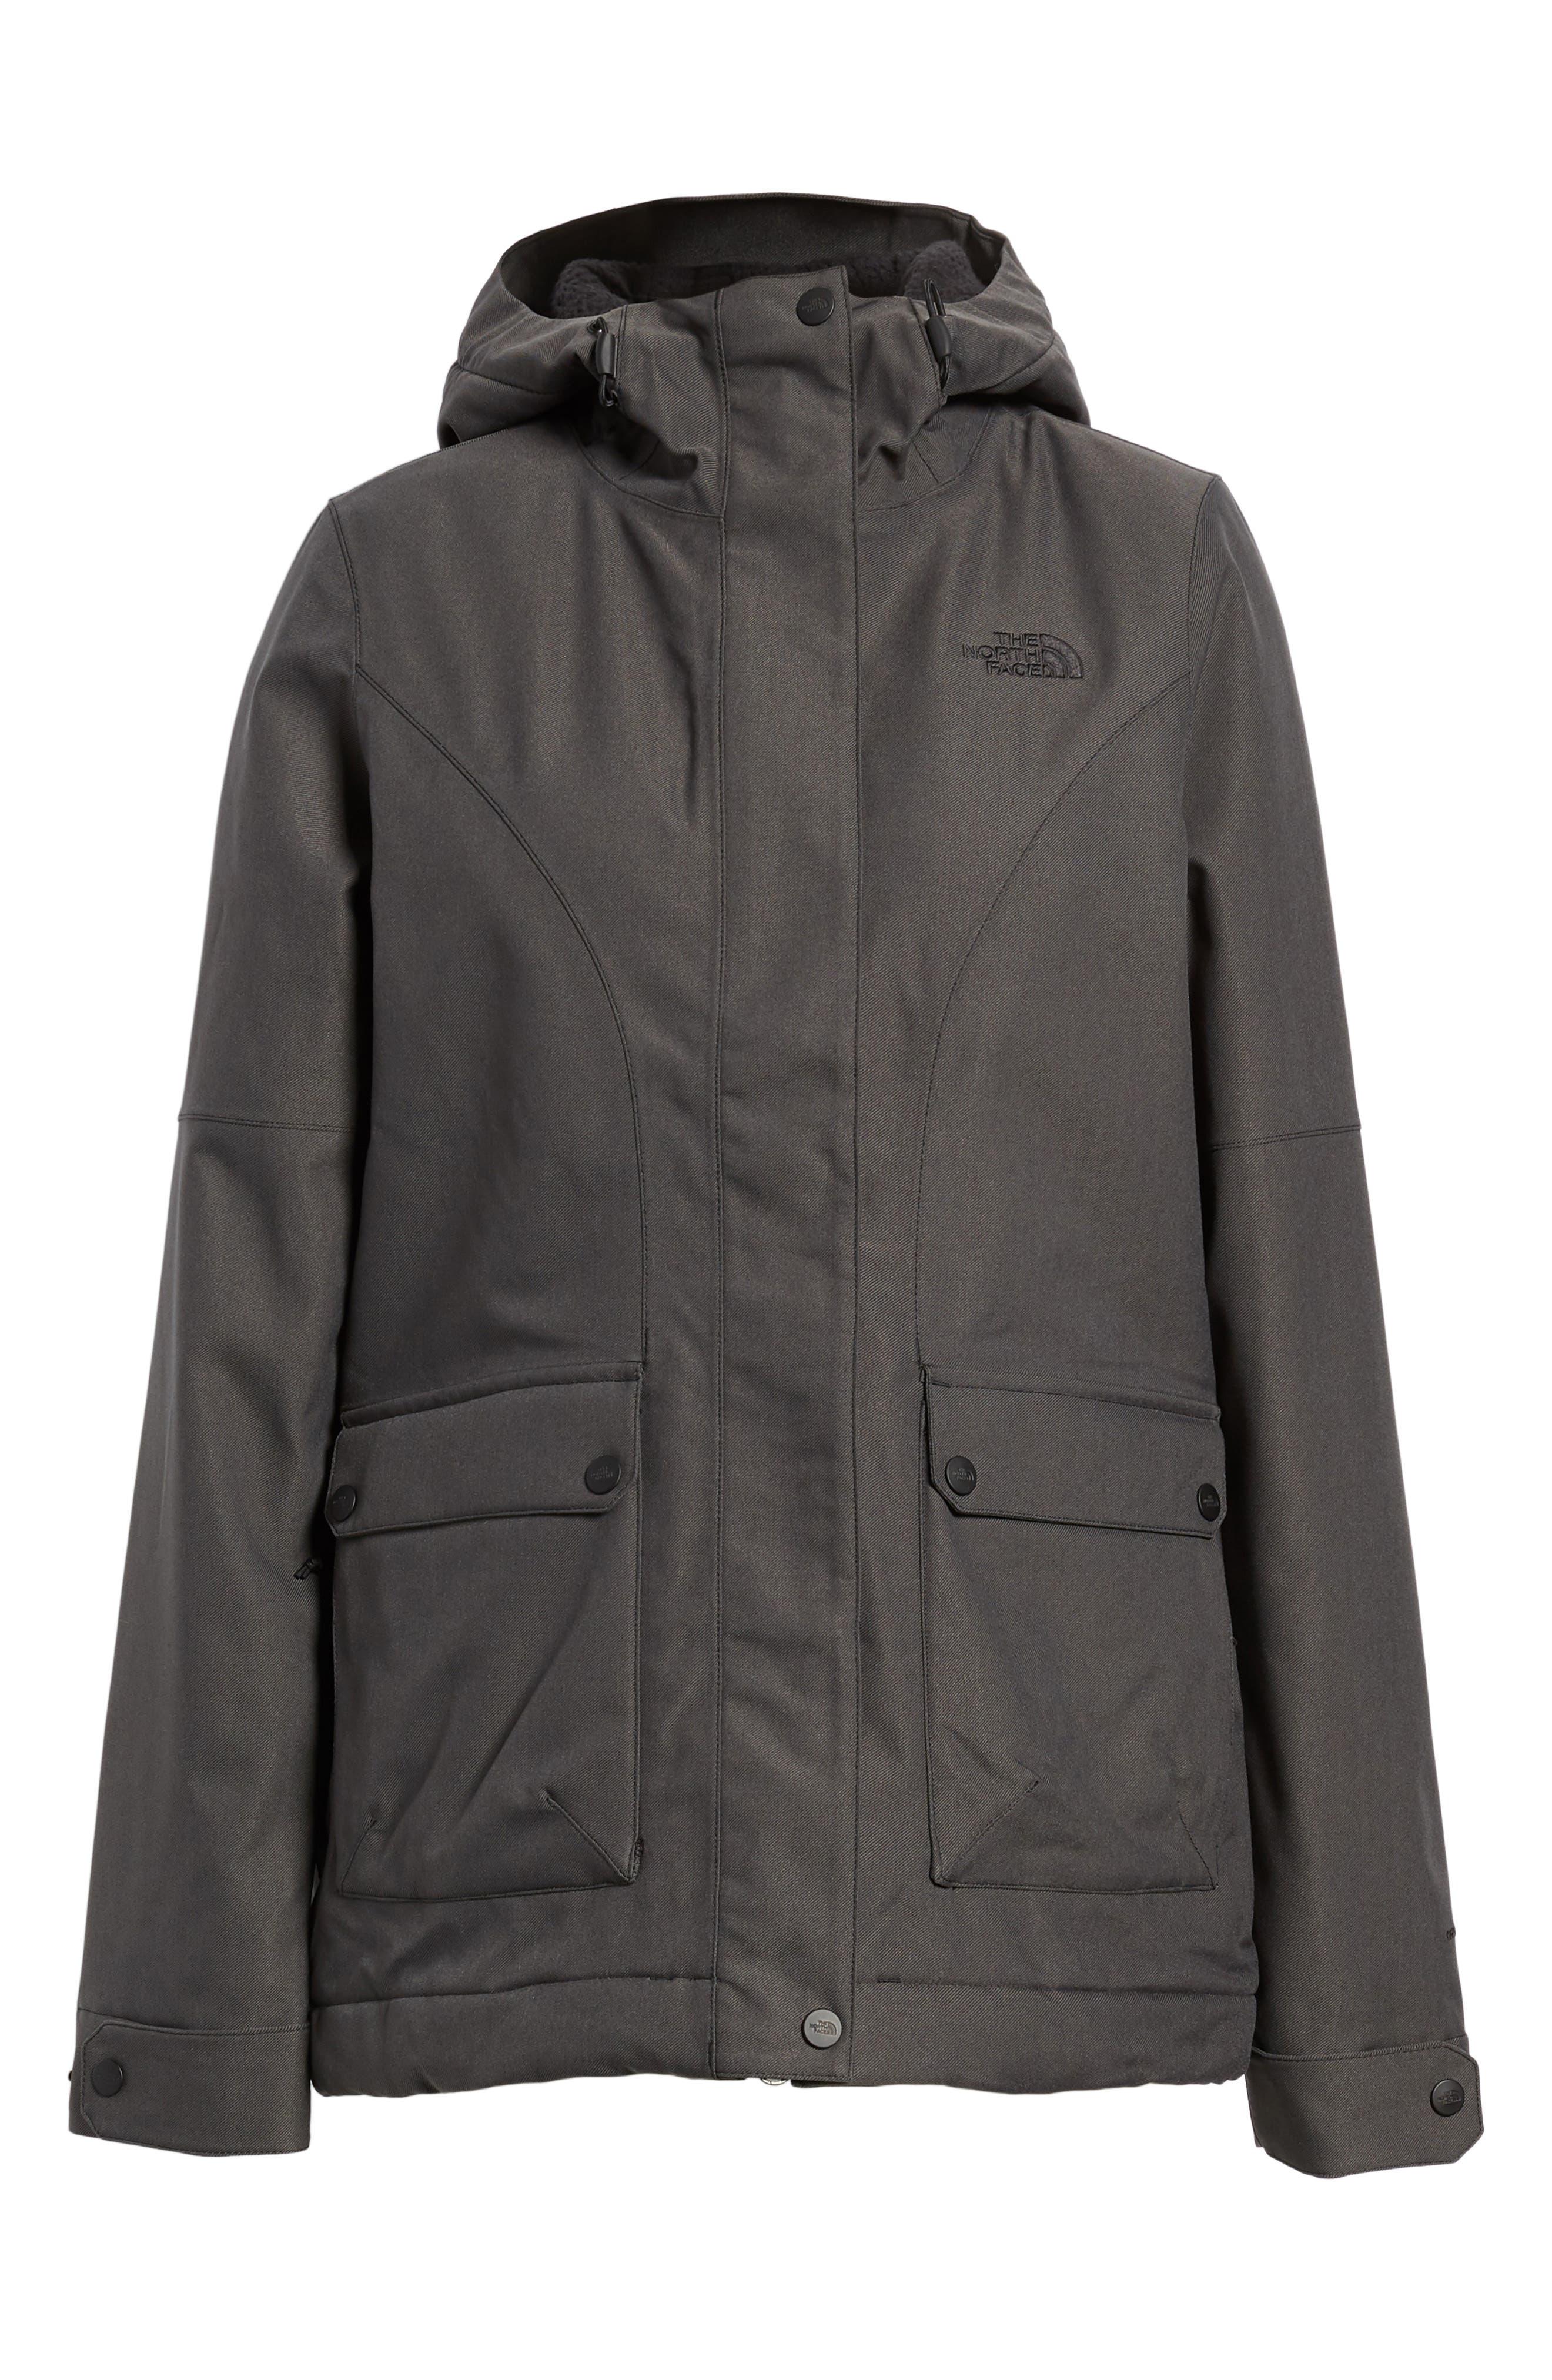 Firesyde Field Jacket,                         Main,                         color, Tnf Black Heather